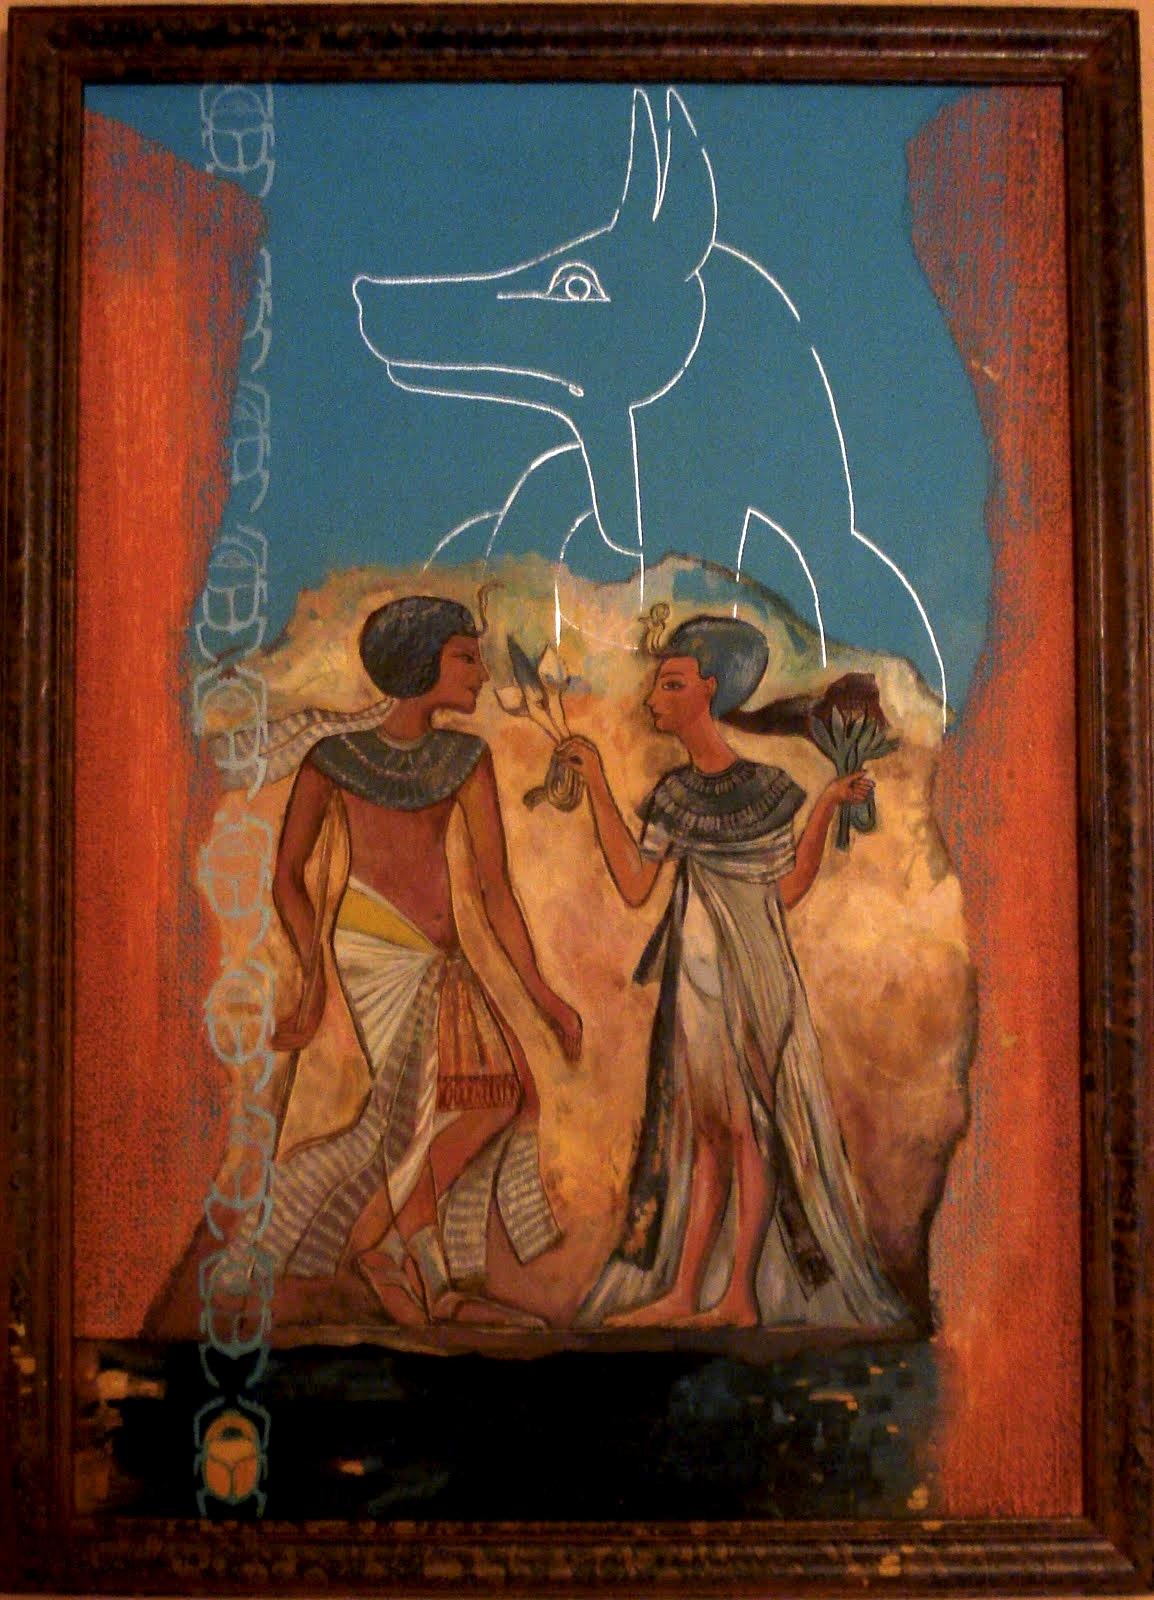 Gli Antici Egizi